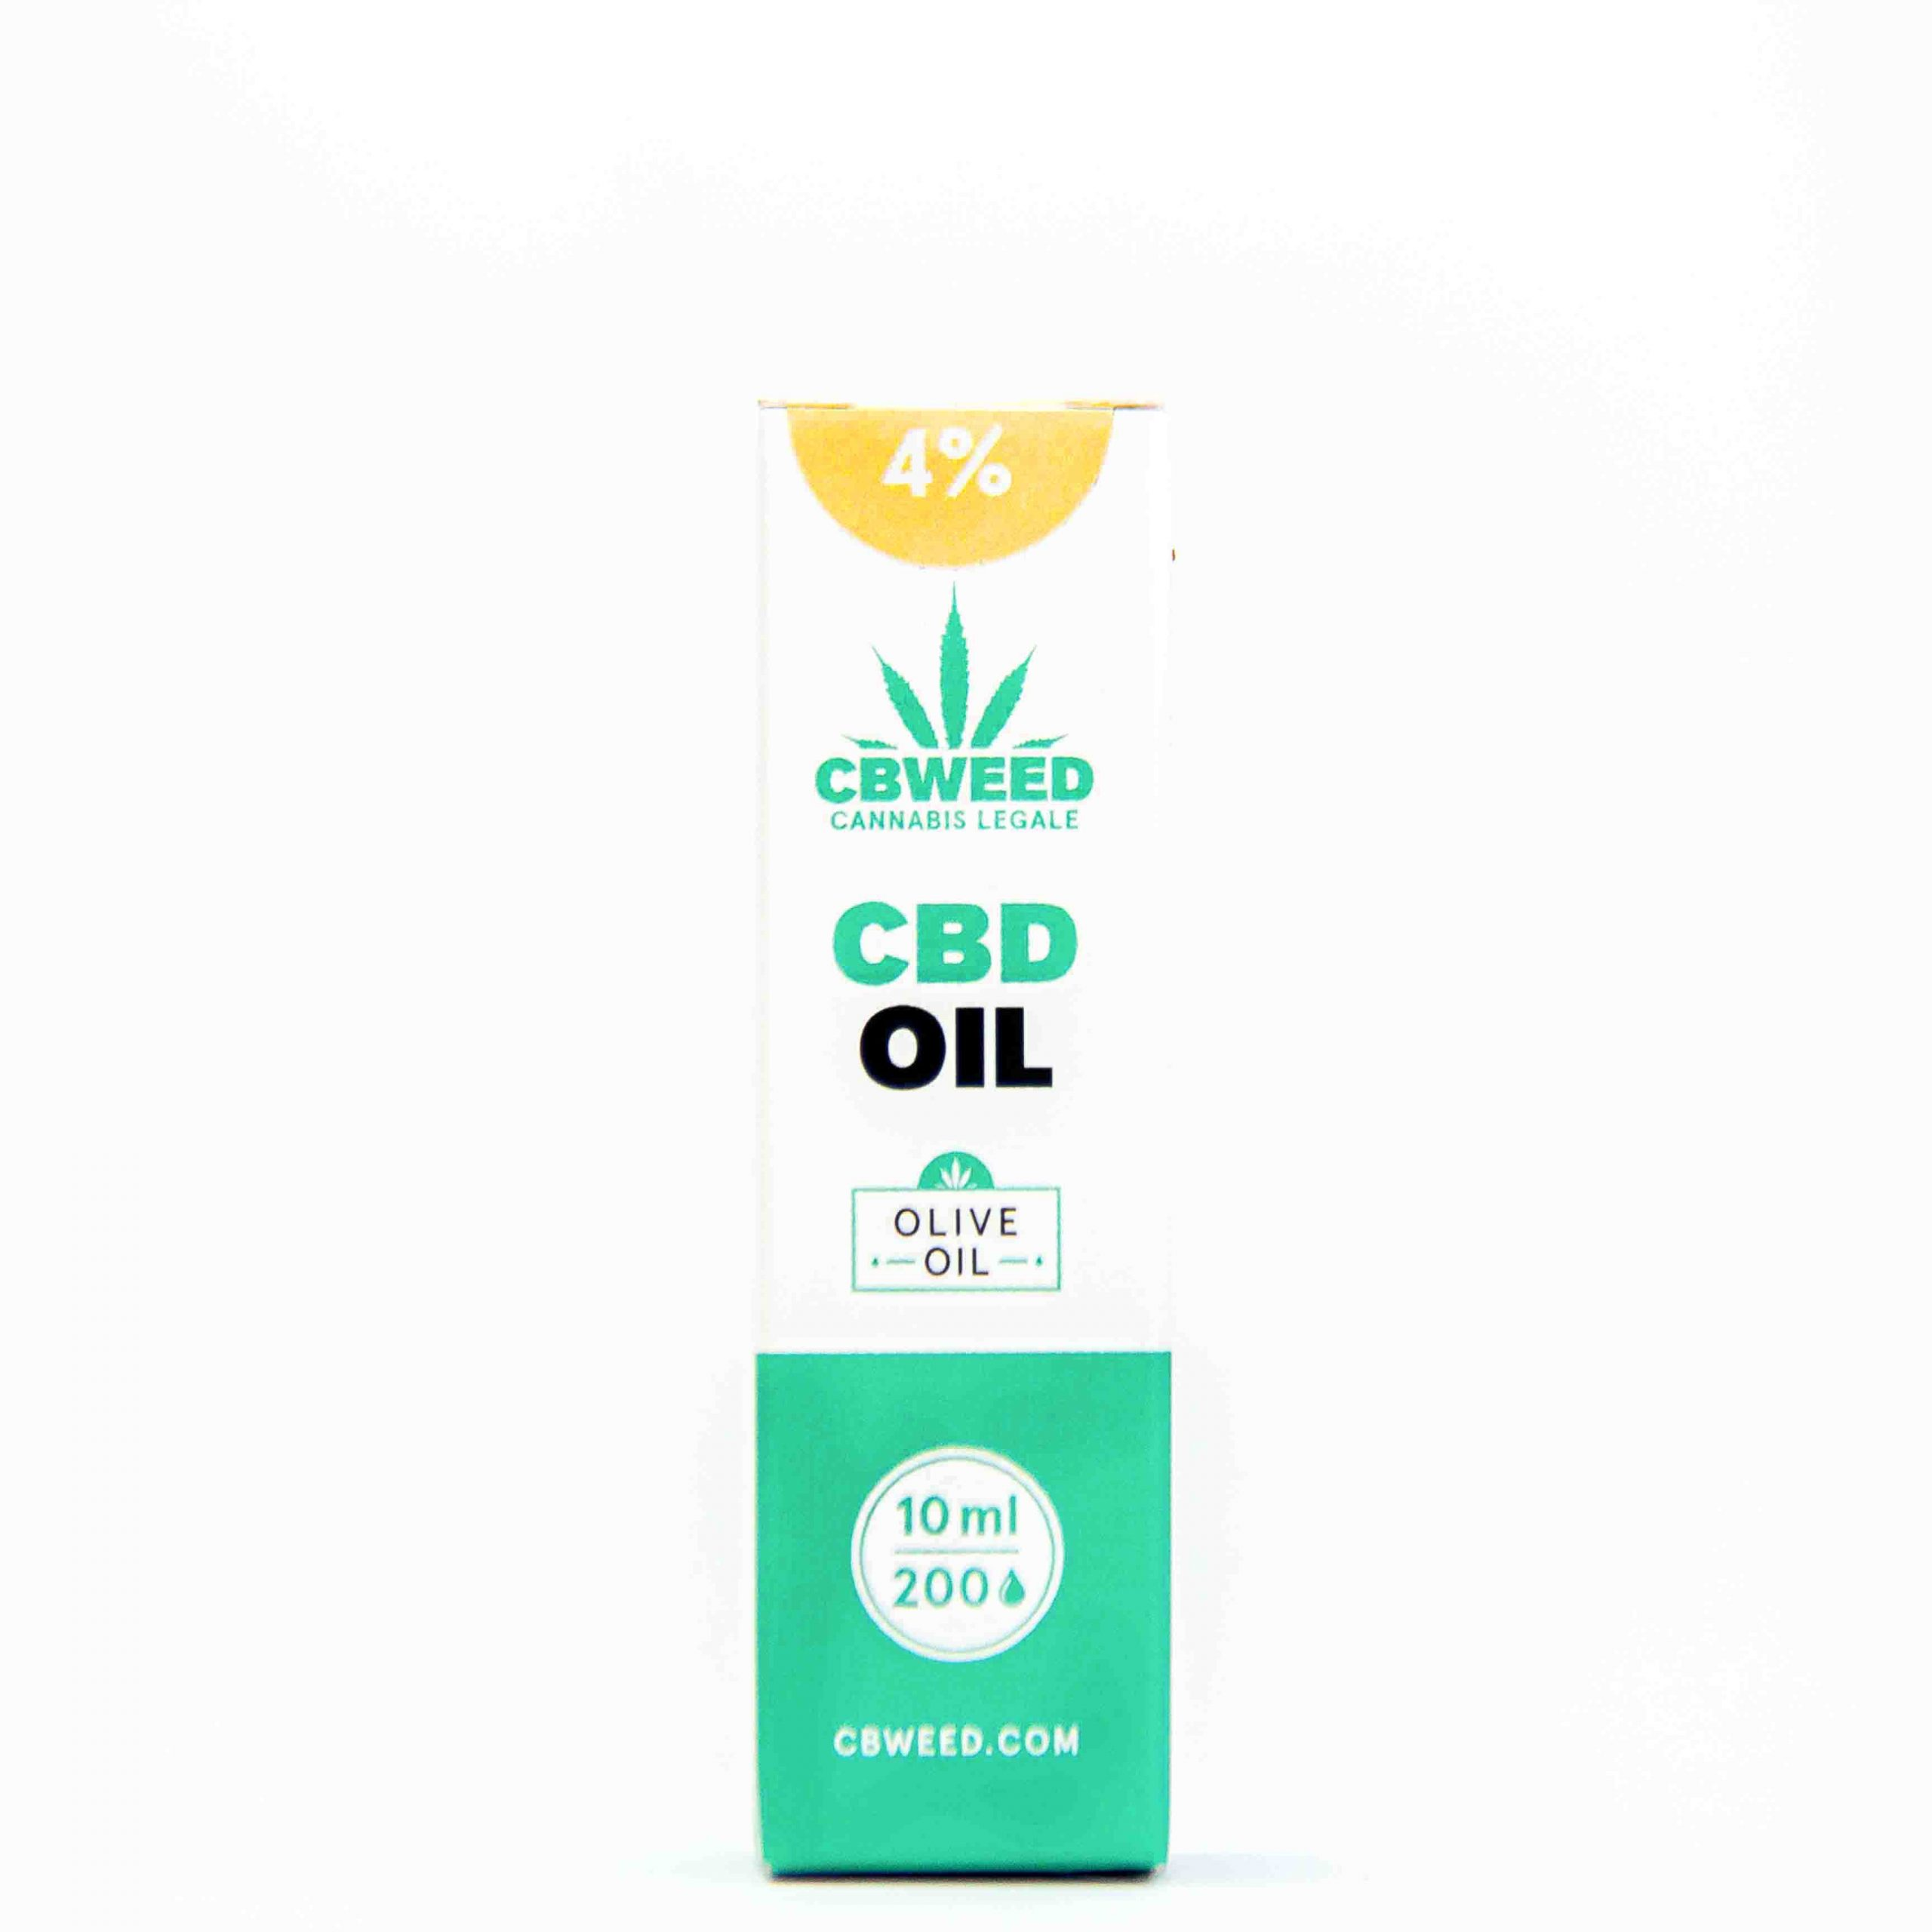 cbd oil scaled - Oliva Olio CBD 4%